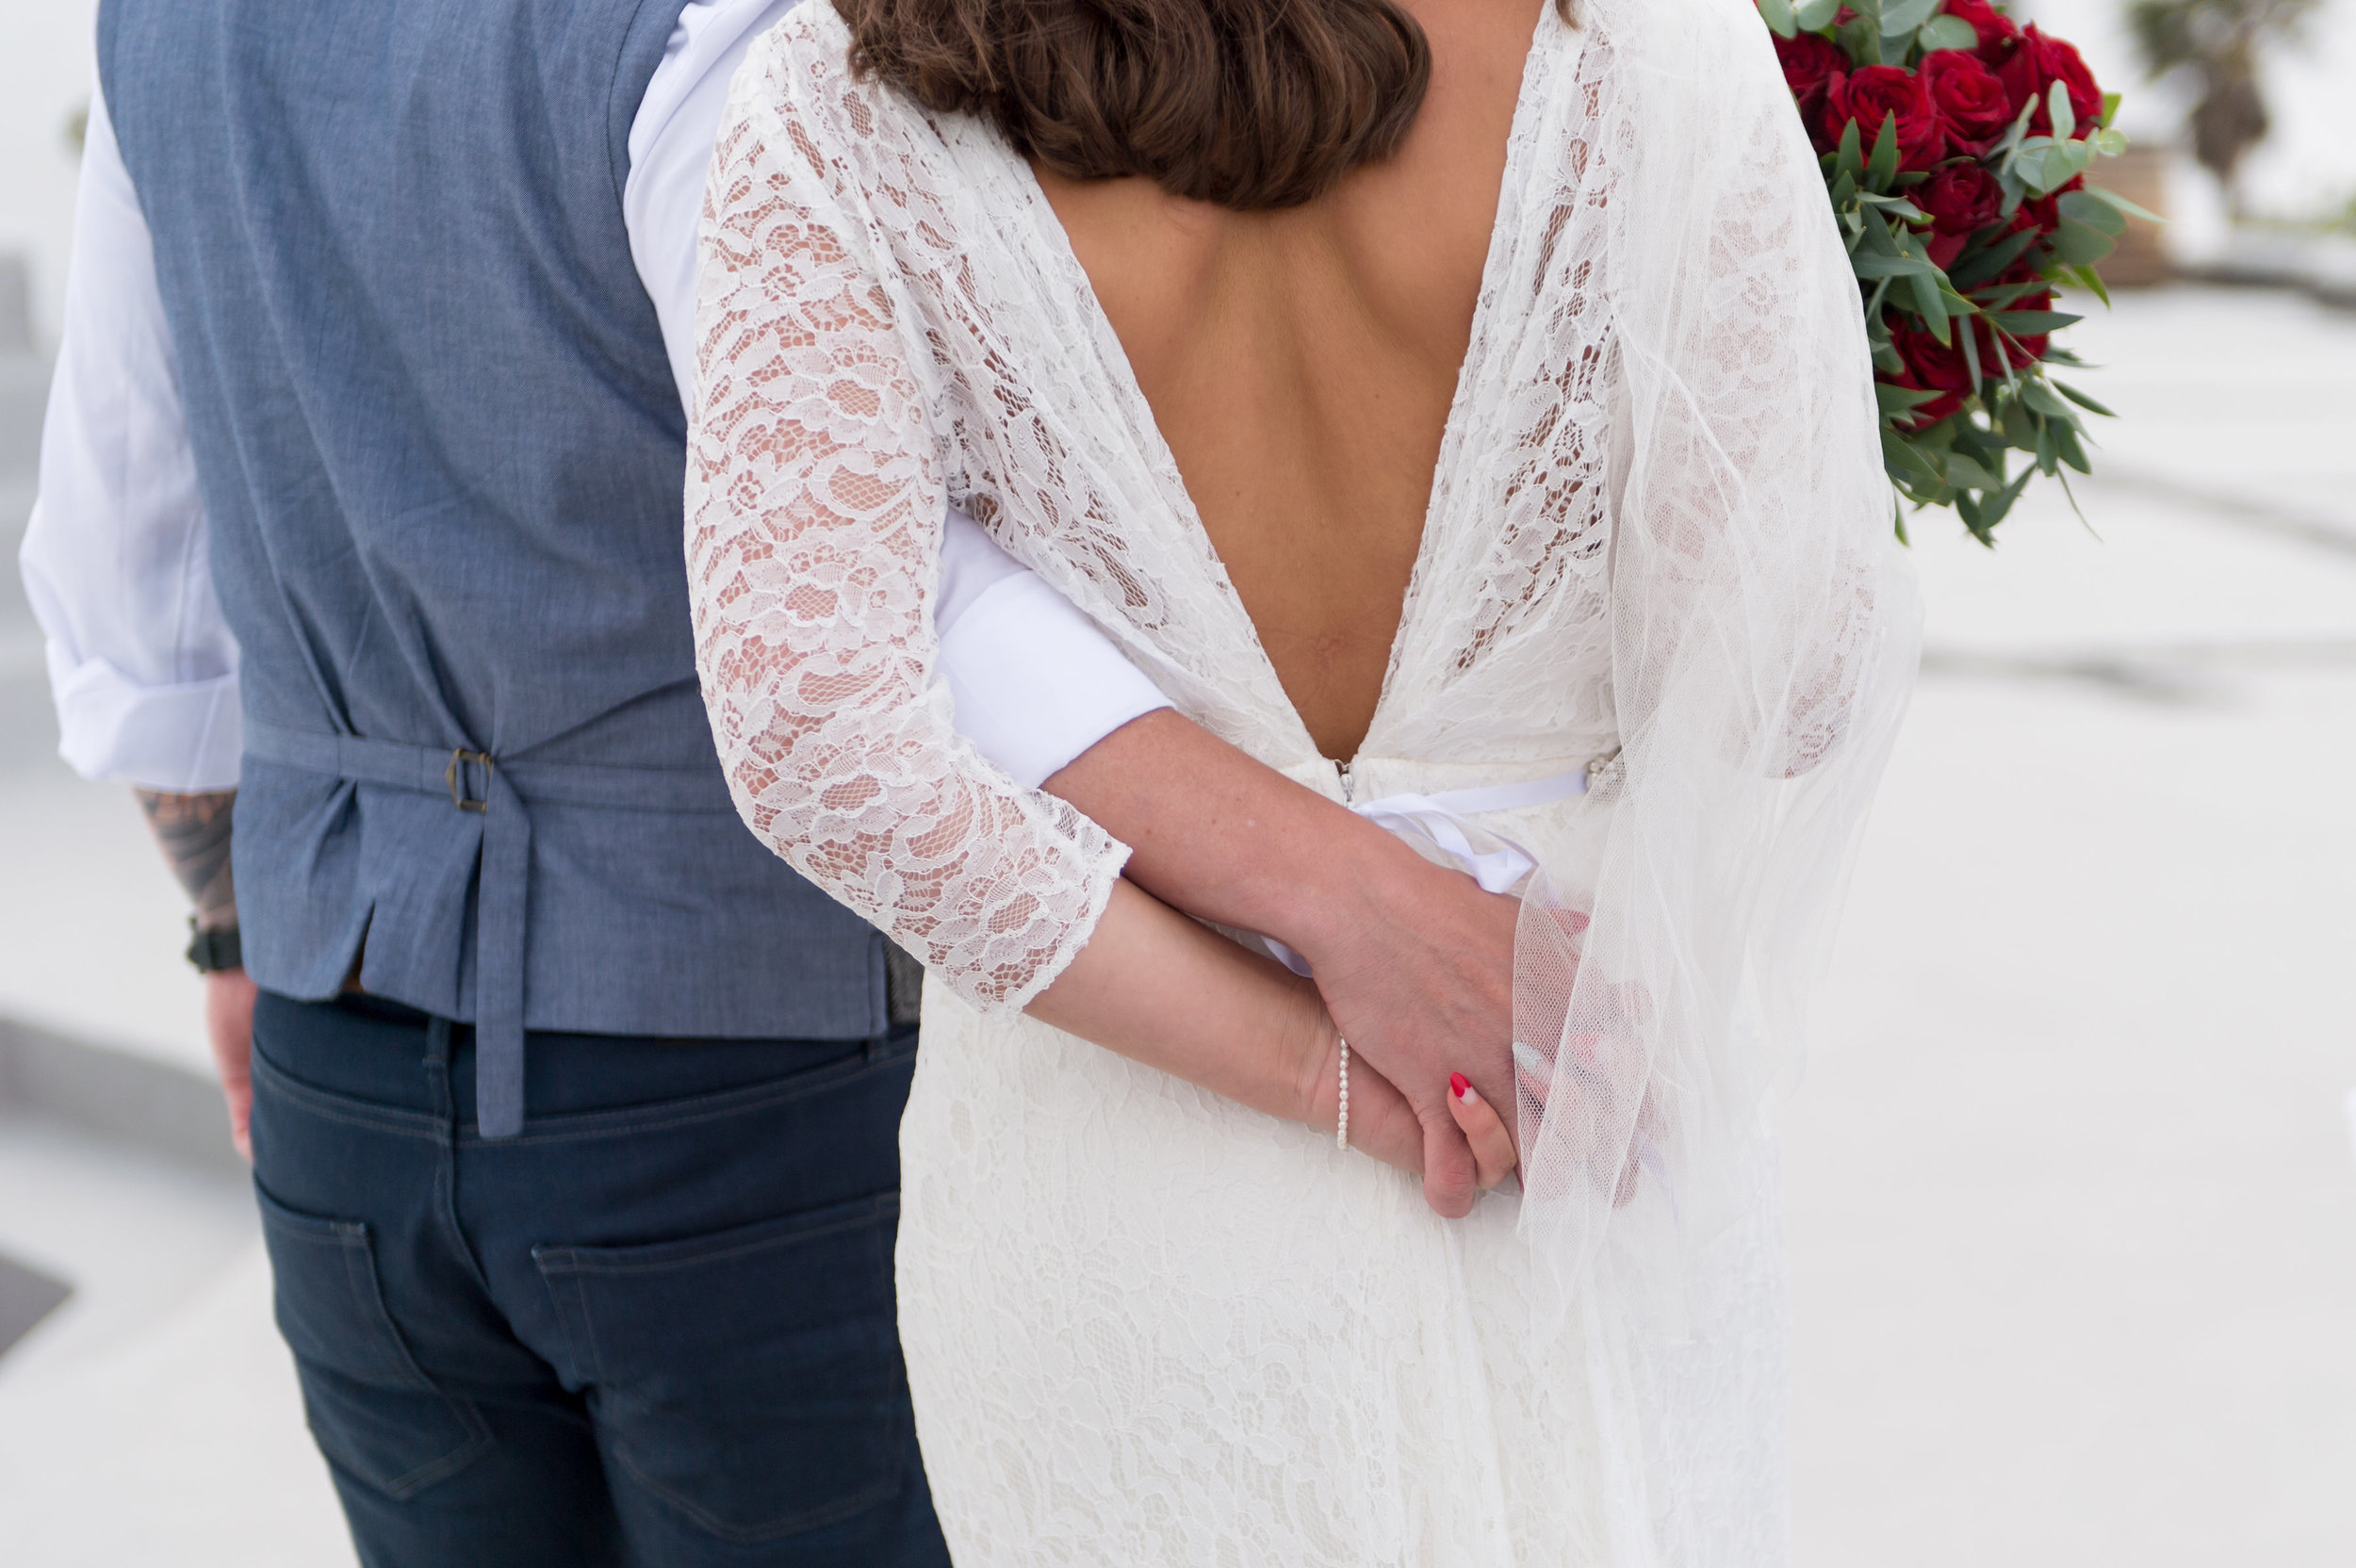 Beautiful bride Stephanie wears a wedding dress by Halfpenny London